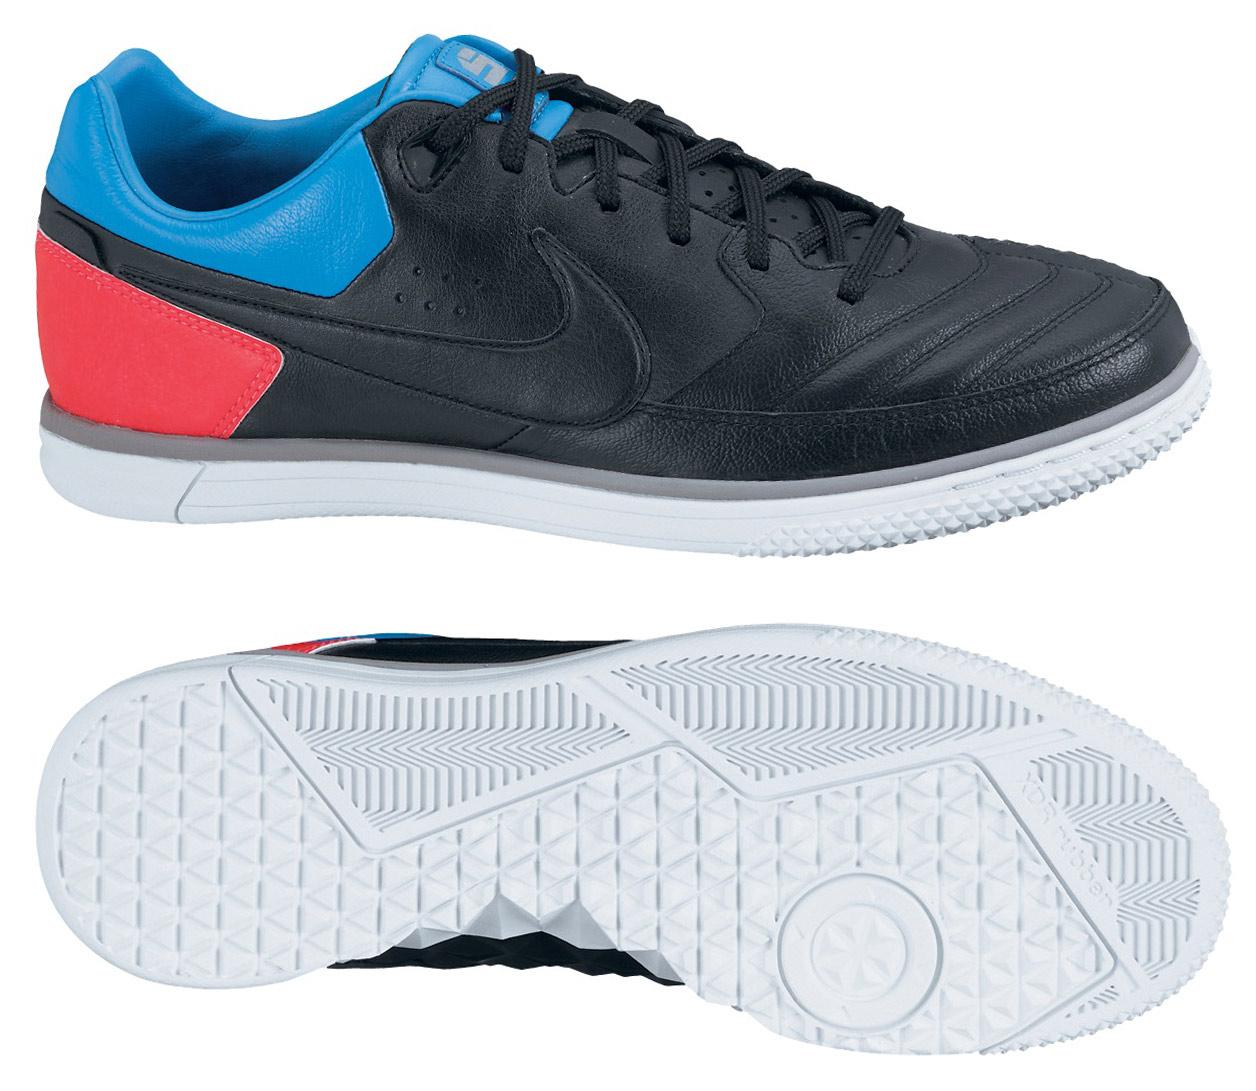 Nike - Nike5 Streetgato Sort/Blå/Pink